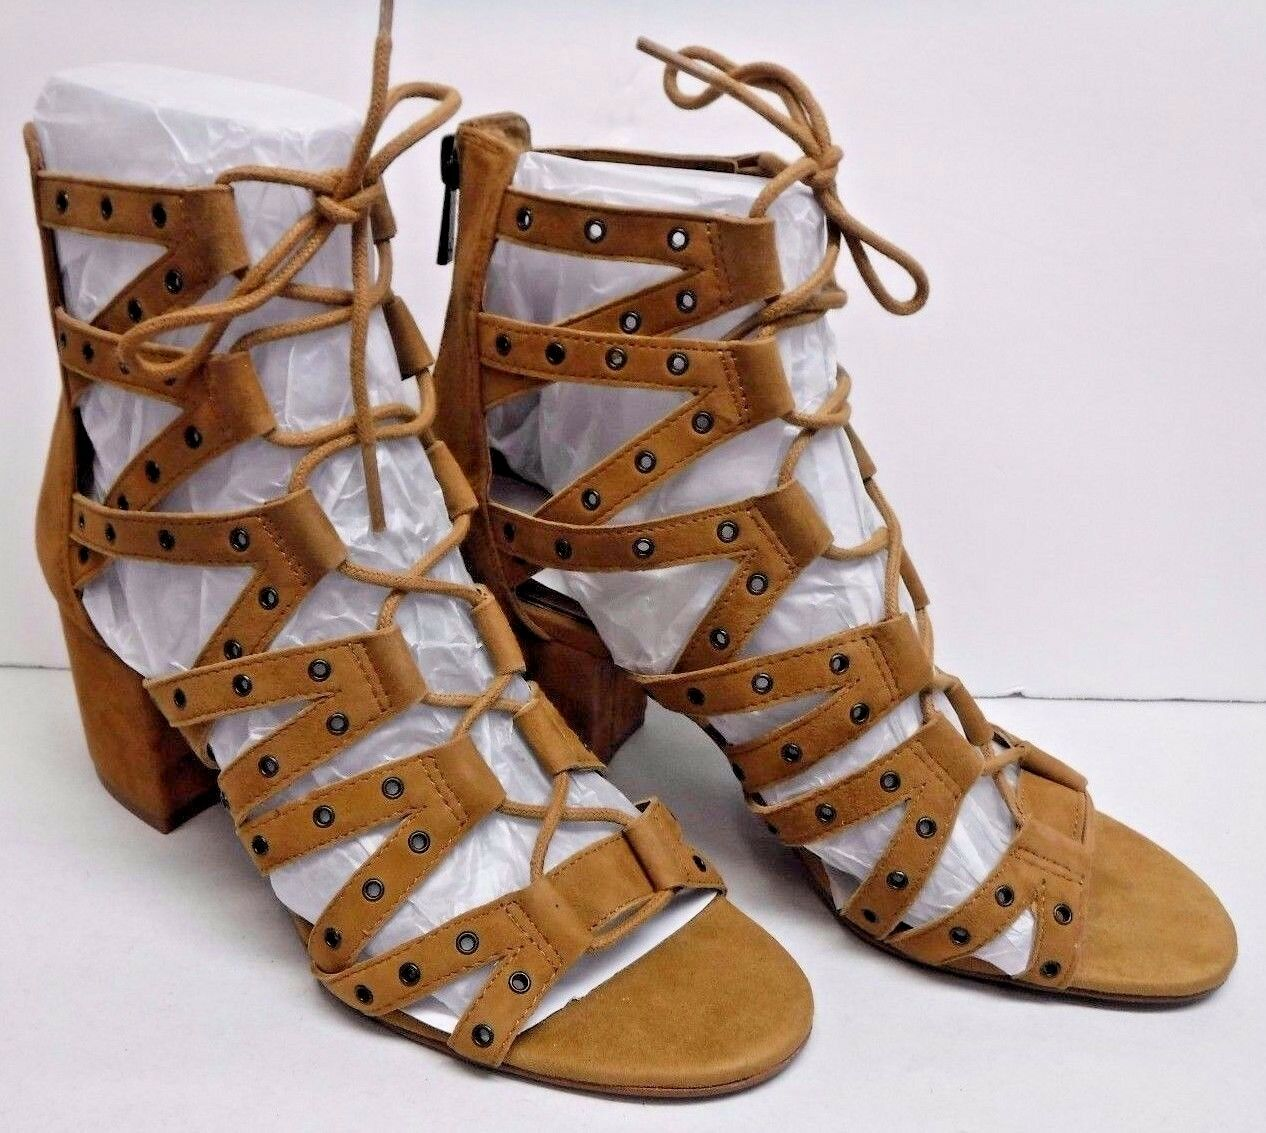 Jessica Simpson Größe 6 Honey Braun Leder Sandales Heels Heels Heels New Damenschuhe Schuhes fdaa06